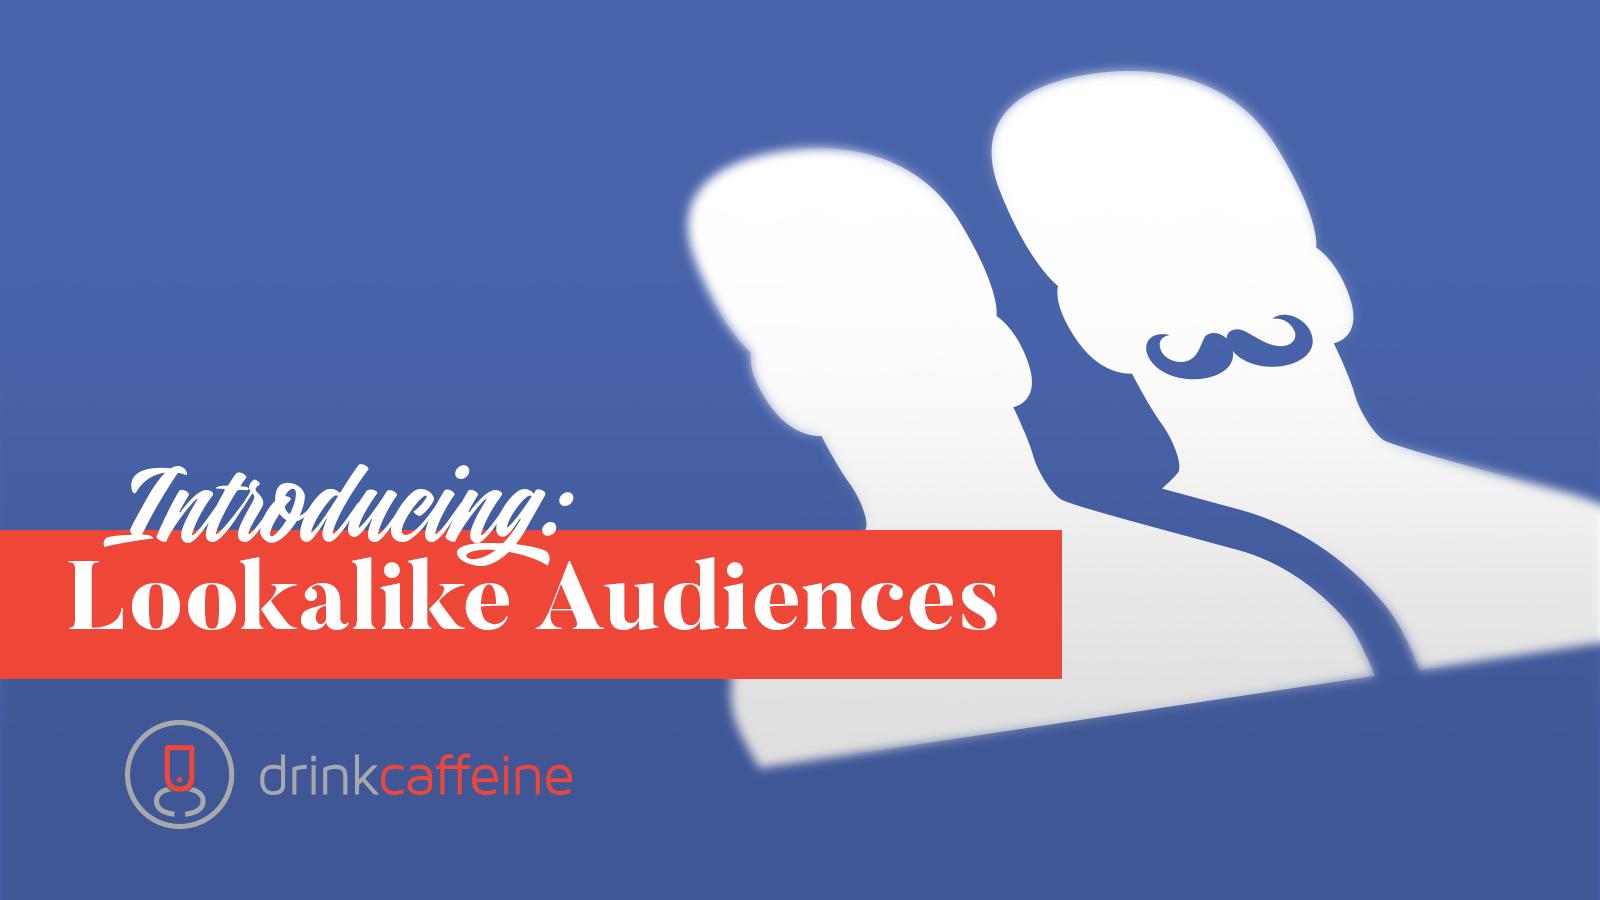 Facebook agrees: Quality > Quantity blog image